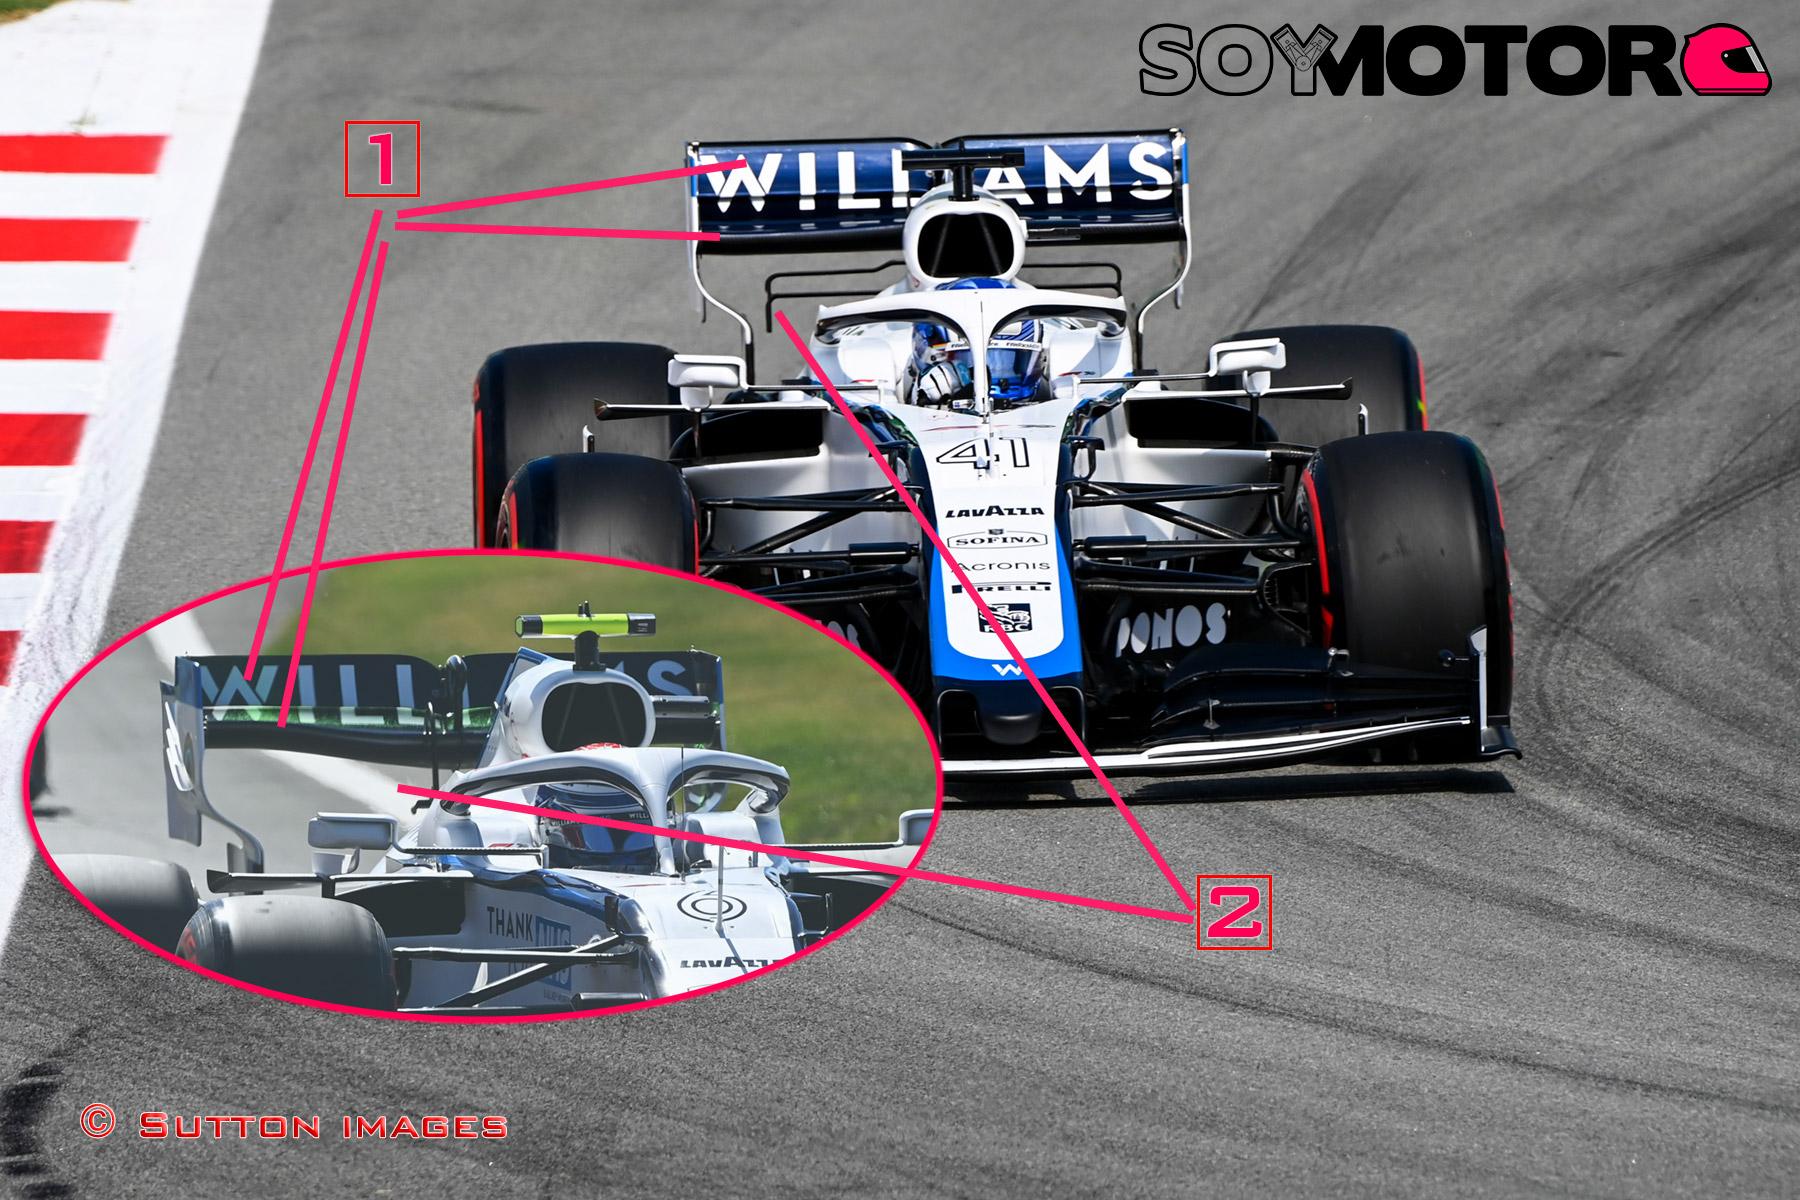 williams-configuracion-trasera-soymotor.jpg